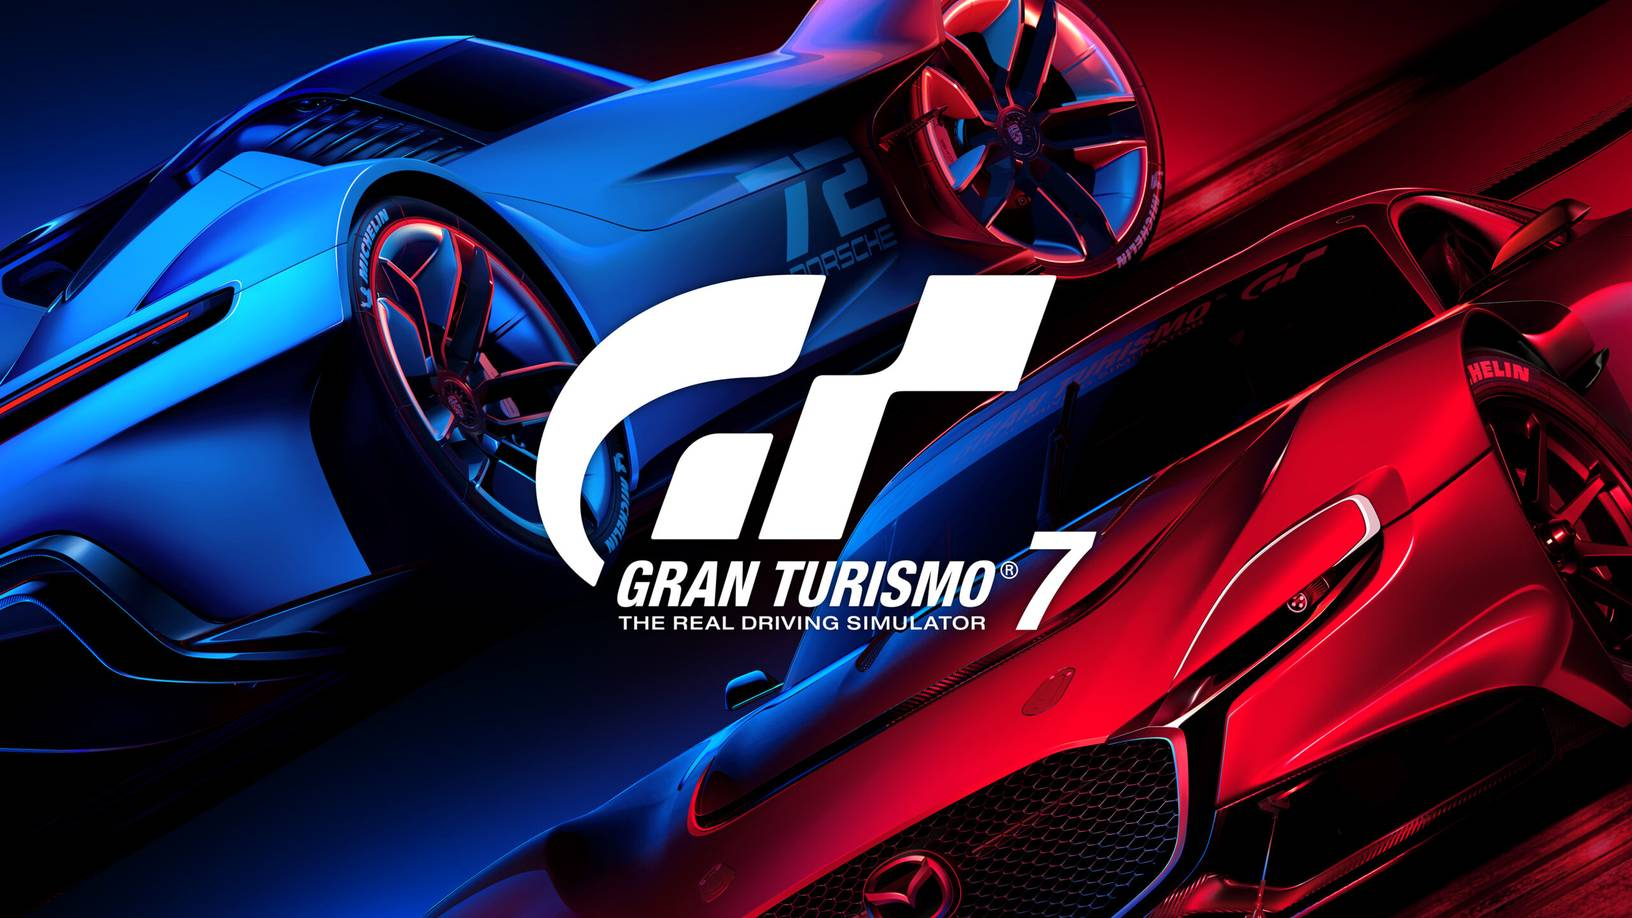 Gran Turismo 7: New 4K screenshots of the pre-order cars